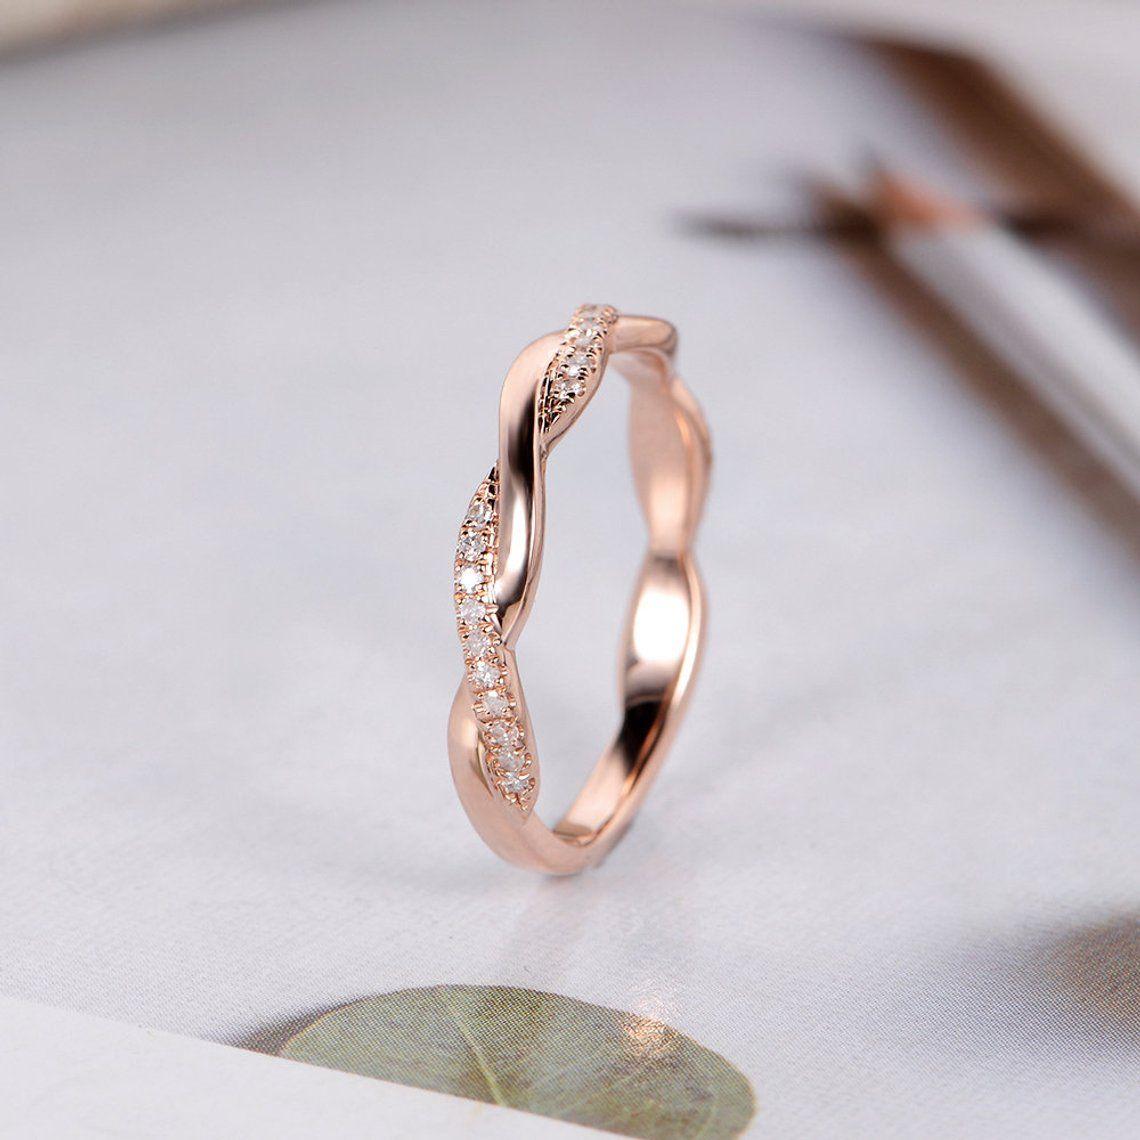 Rose Gold Wedding Band Women Twist Diamond Wedding Ring Infinity Half Eternity Dainty Stacking Bridal Delicate Bridal Antique Ring In 2019 Wedding Rings We